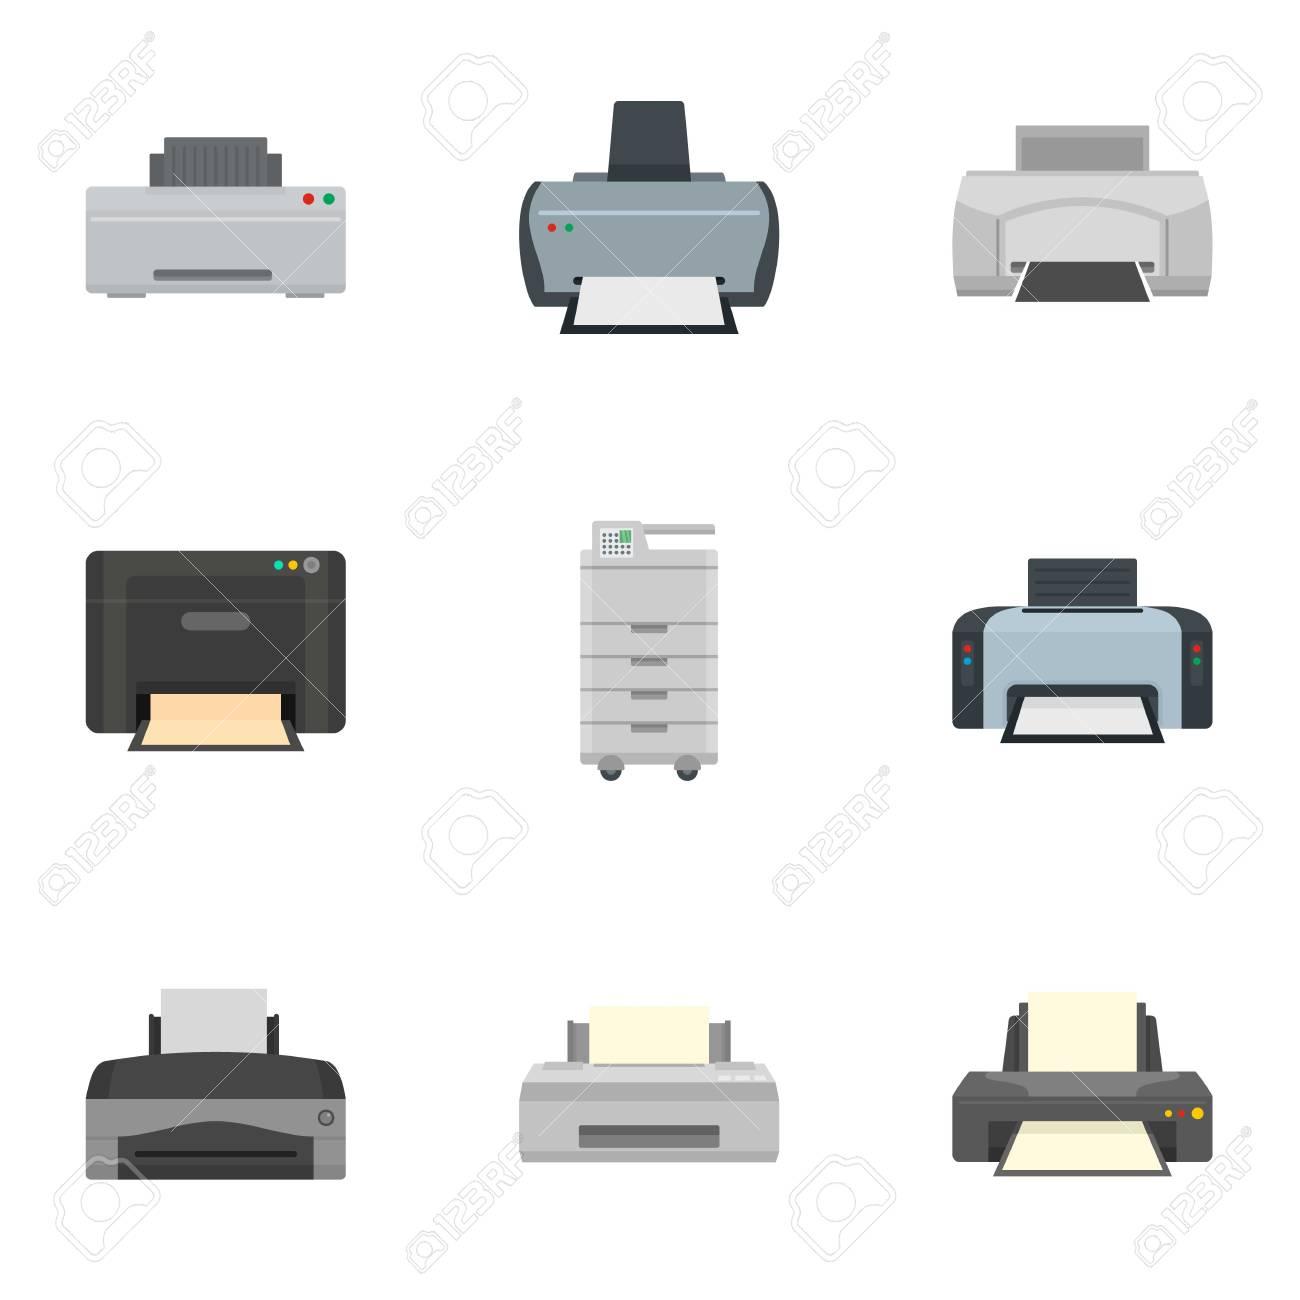 inkjet printer icon set flat set of 9 inkjet printer vector royalty free cliparts vectors and stock illustration image 109592986 inkjet printer icon set flat set of 9 inkjet printer vector